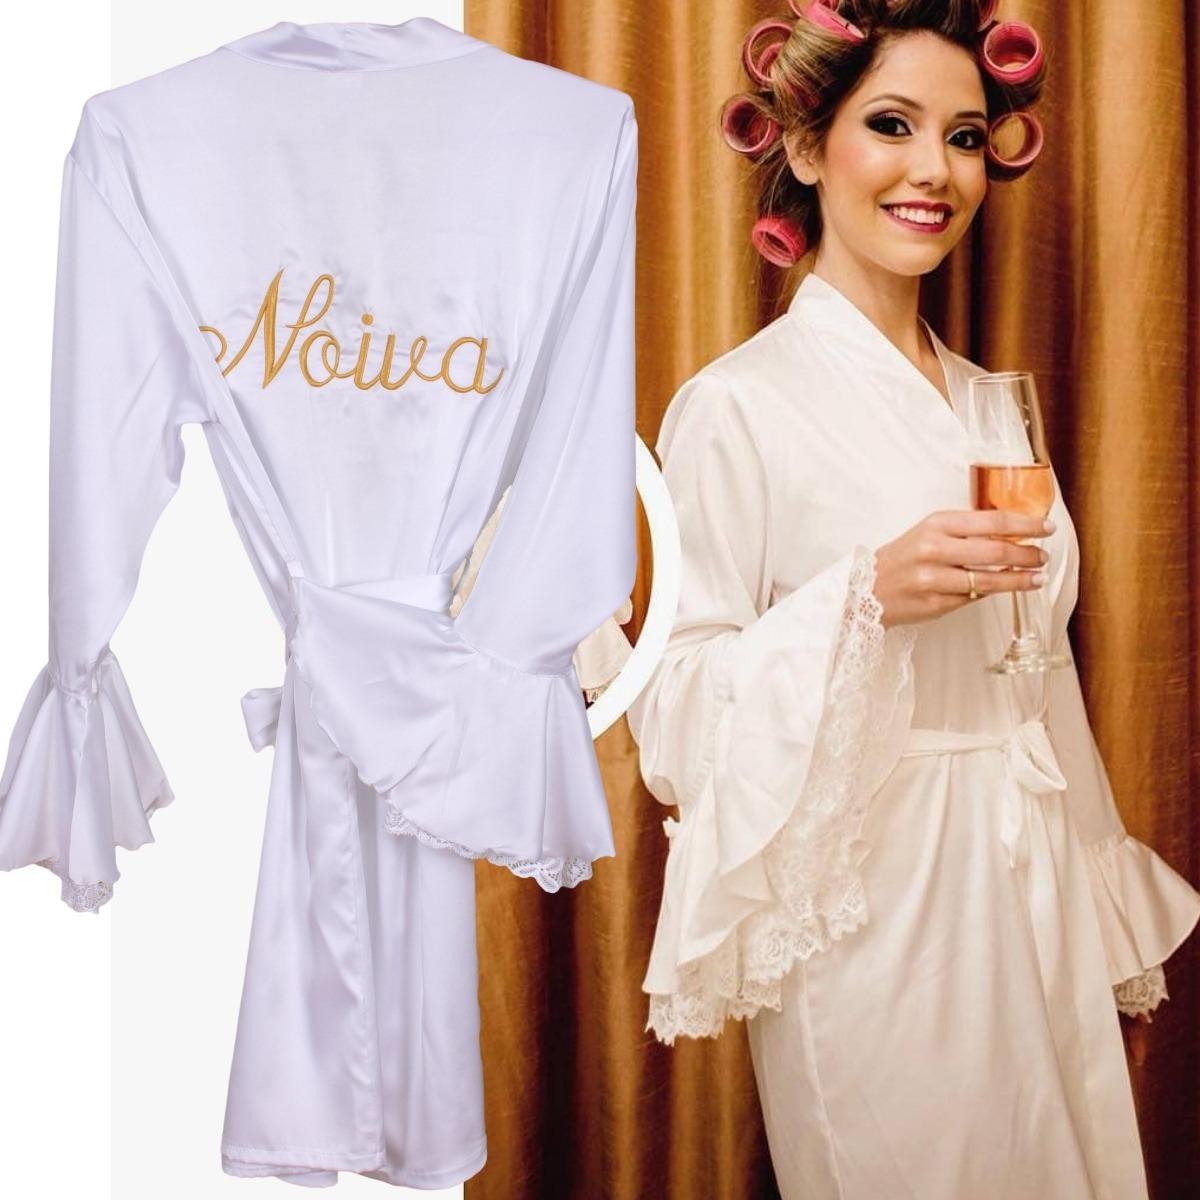 e530c4d3f robe roupao cetim robby cetim robe seda robe noiva luxo. Carregando zoom.